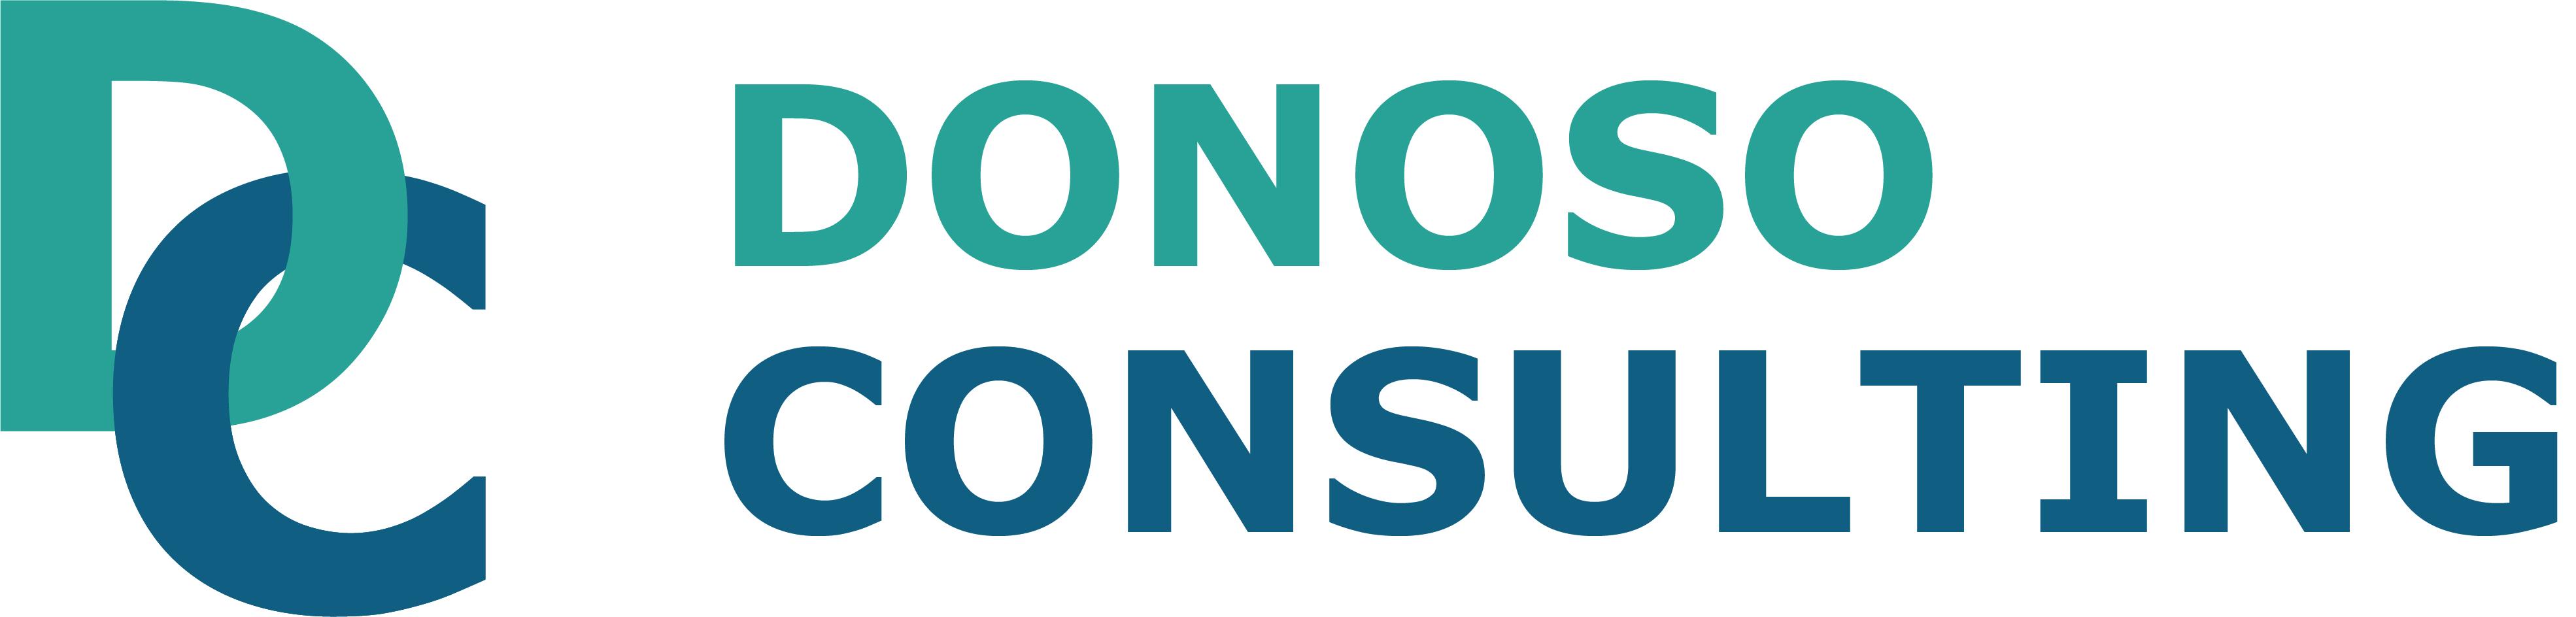 Donoso Consulting